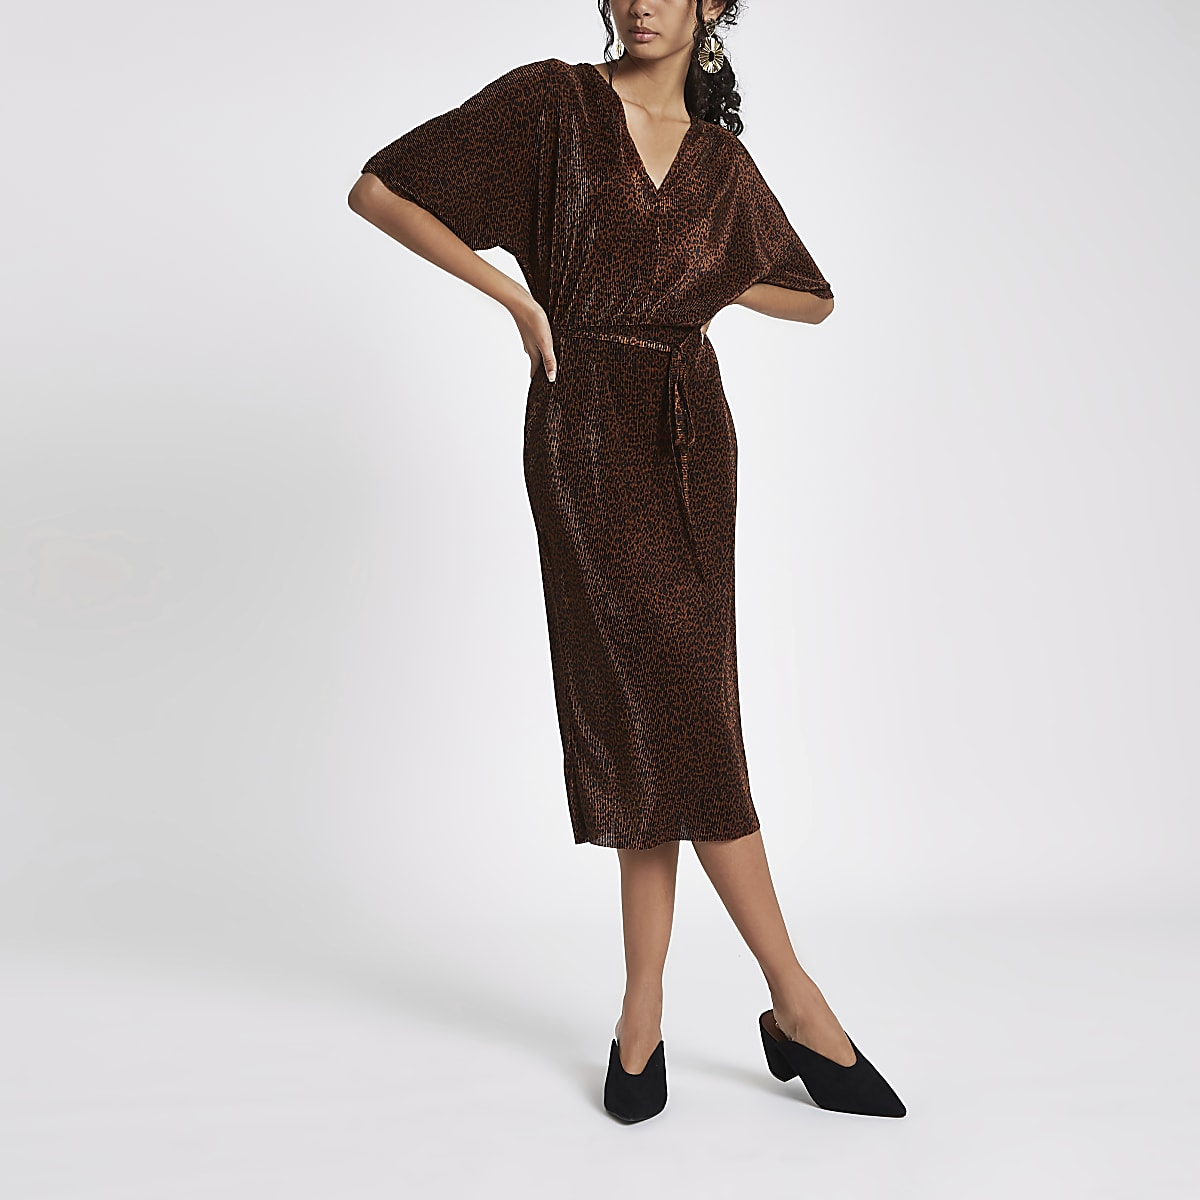 Betere Bruine jurk met luipaardprint en kimonomouwen | River Island DA-33